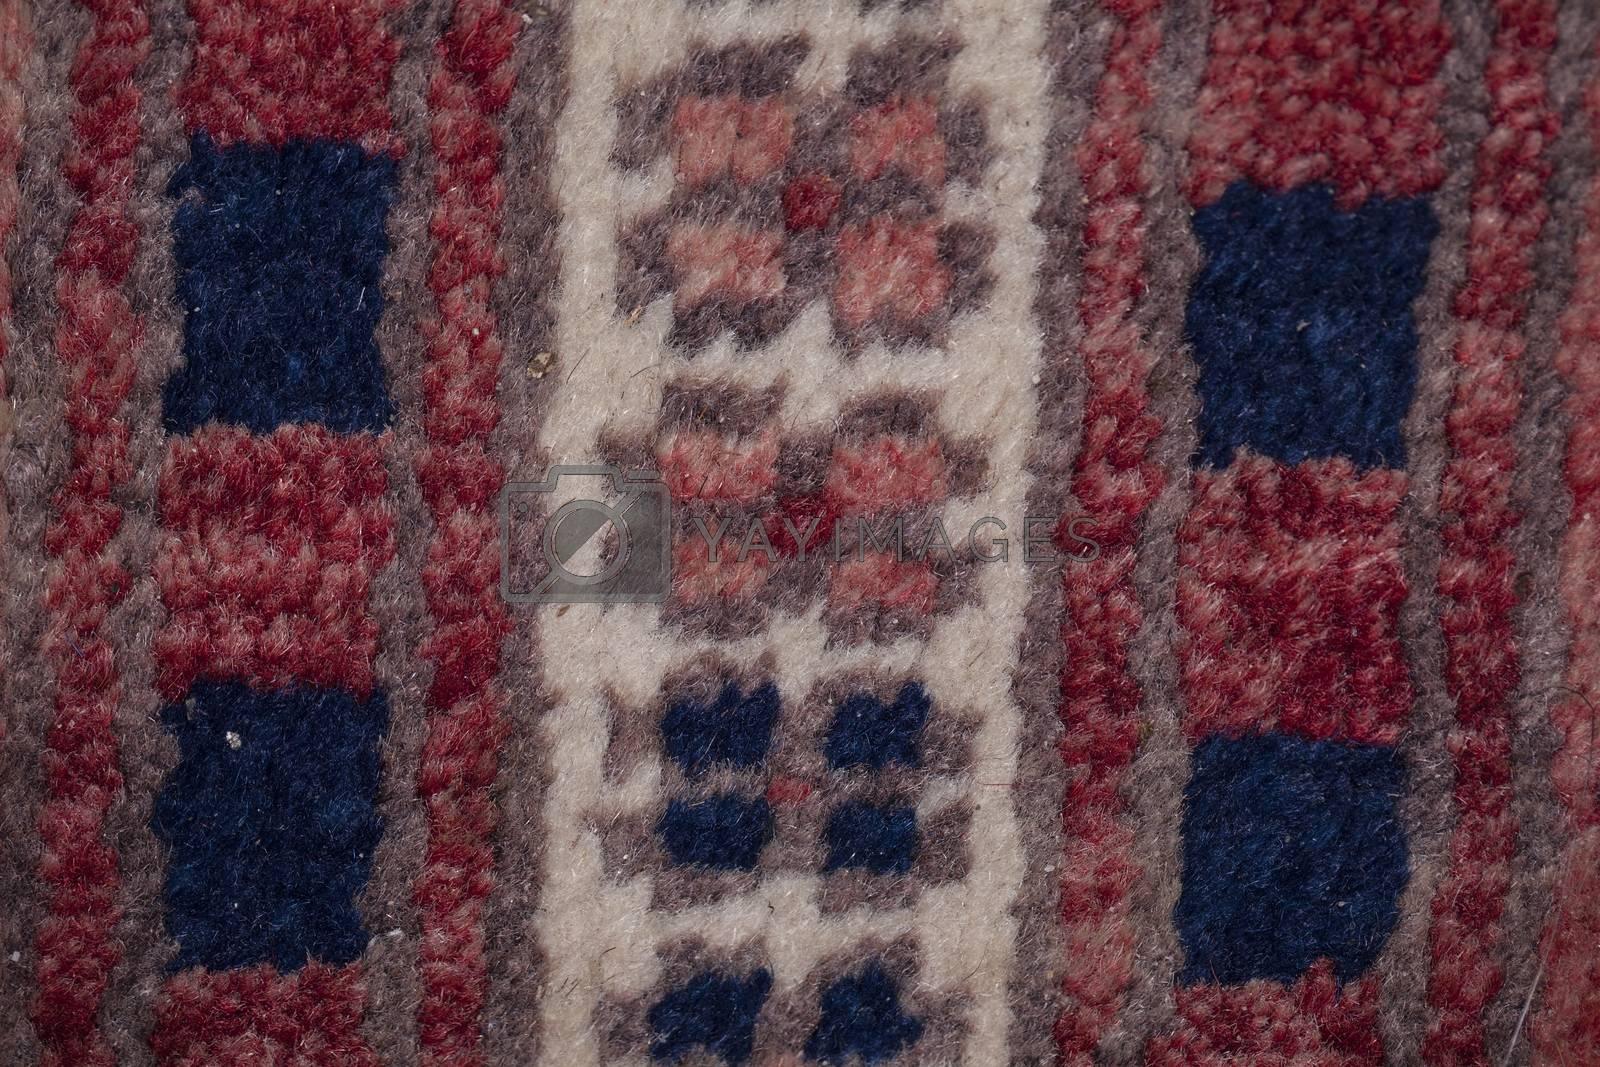 pattern on fabric, closeup background